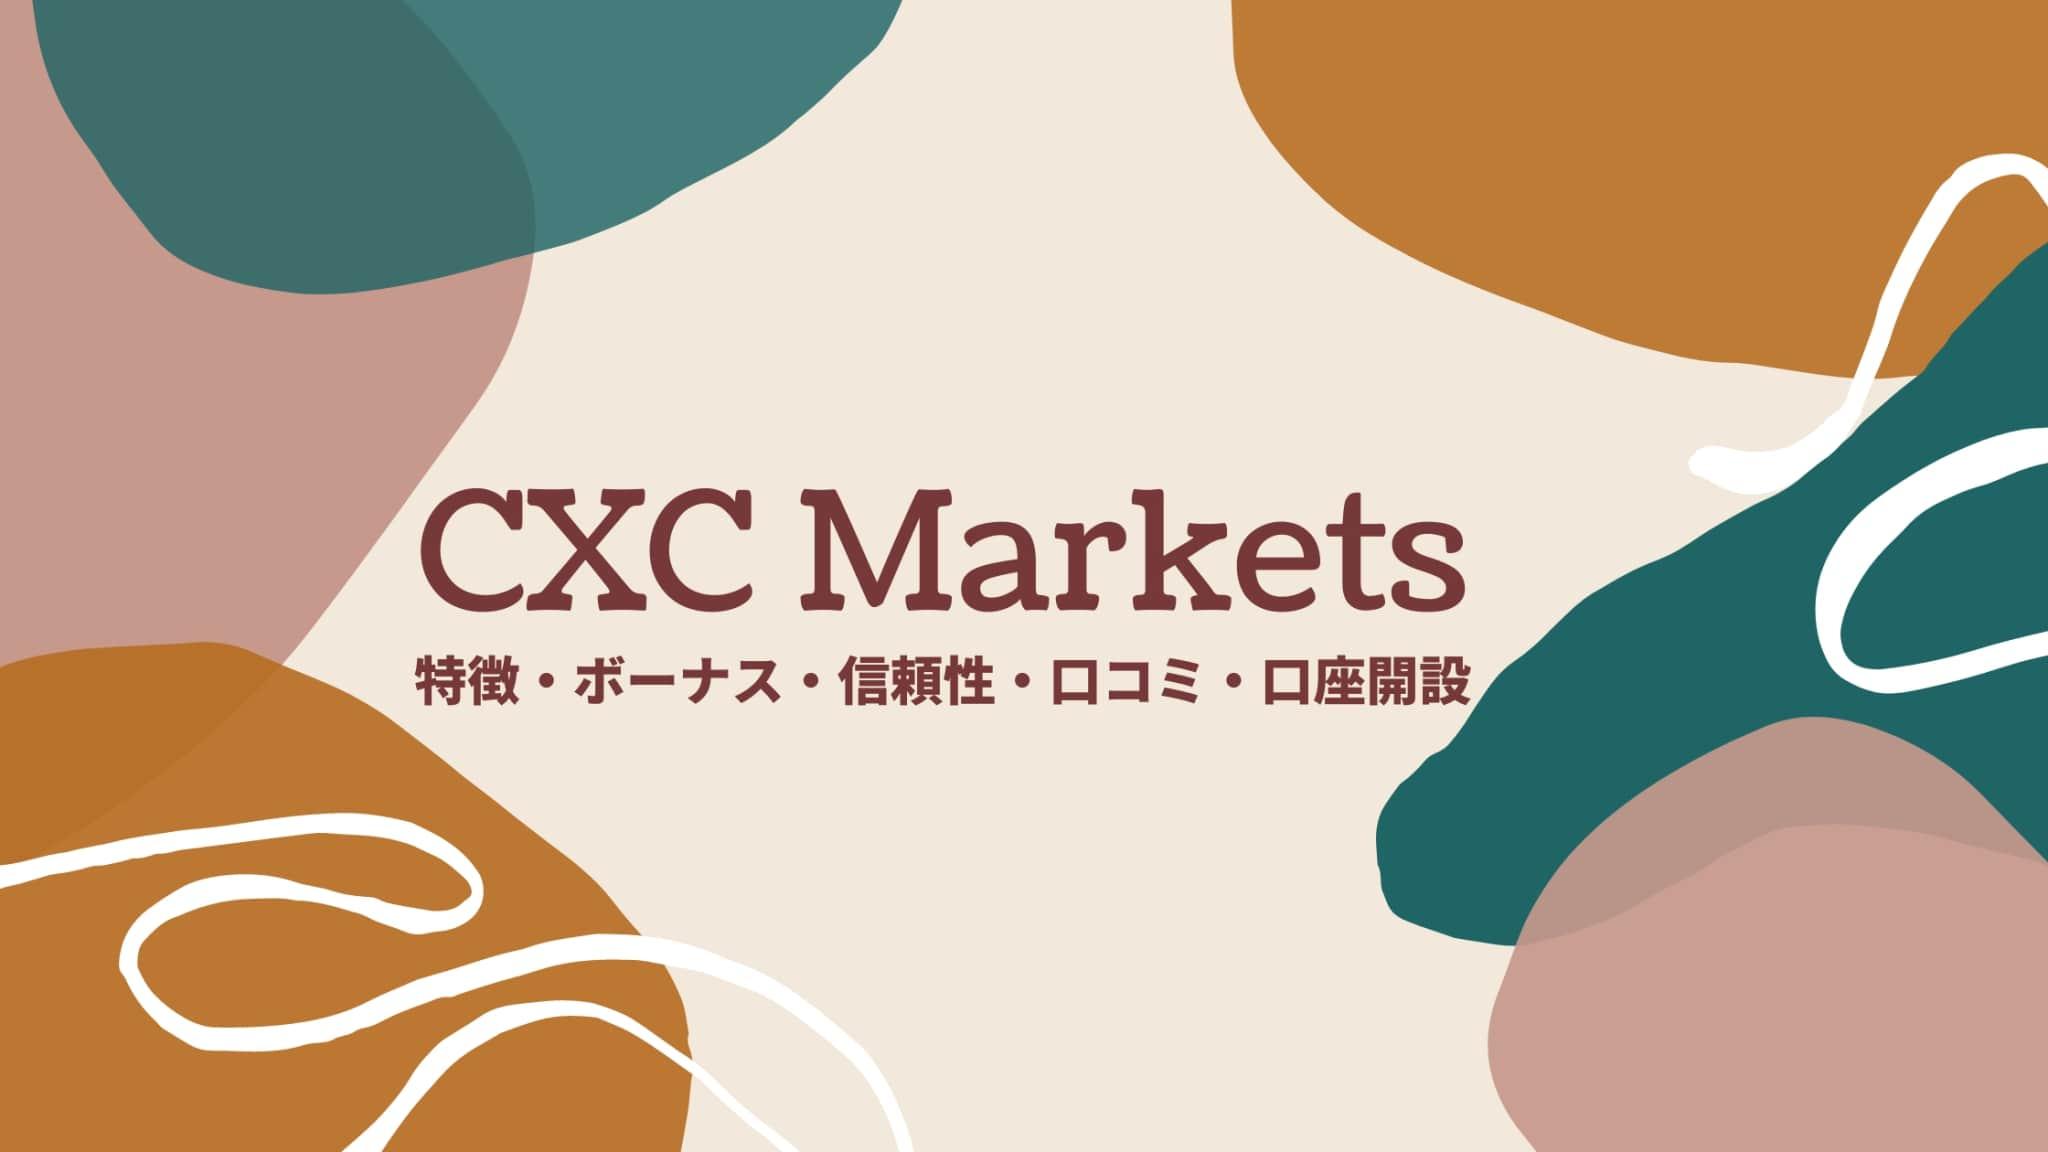 CXC Marketsとは?【豪華なボーナス内容が魅力】